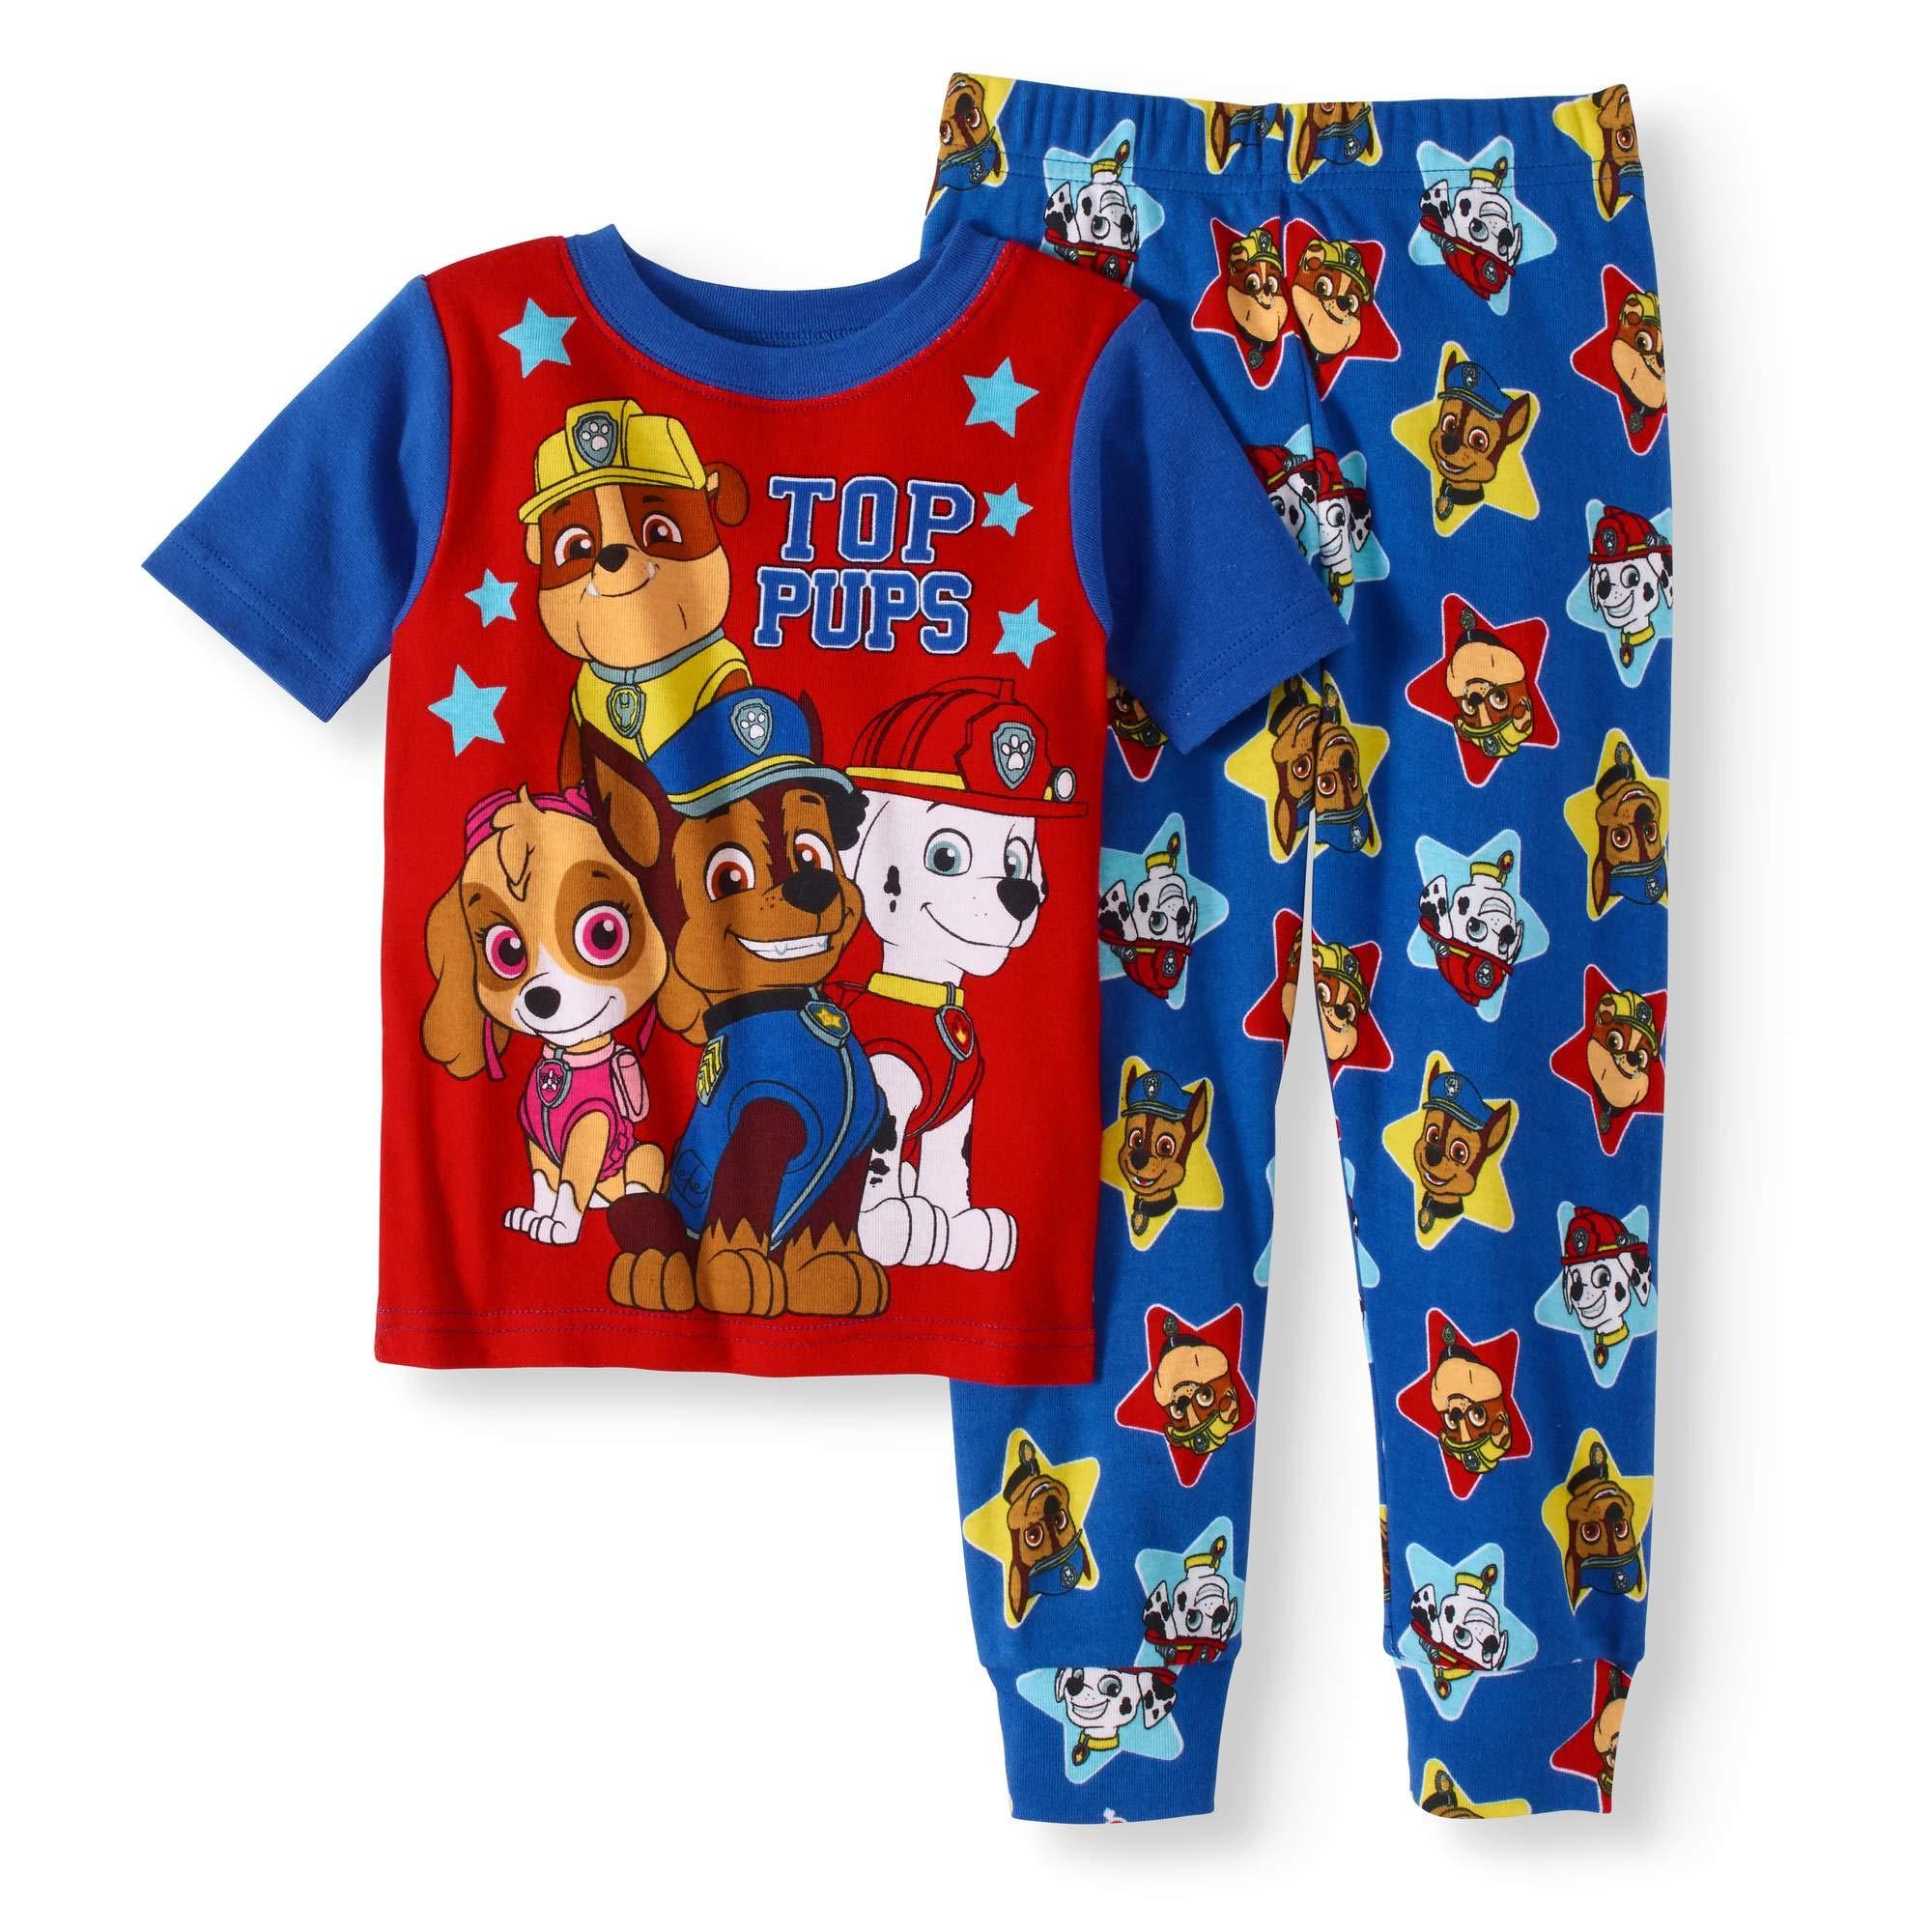 Paw Patrol Nickelodeon PJS Pajama Sleep Wear Set For Toddler Boys (5T)